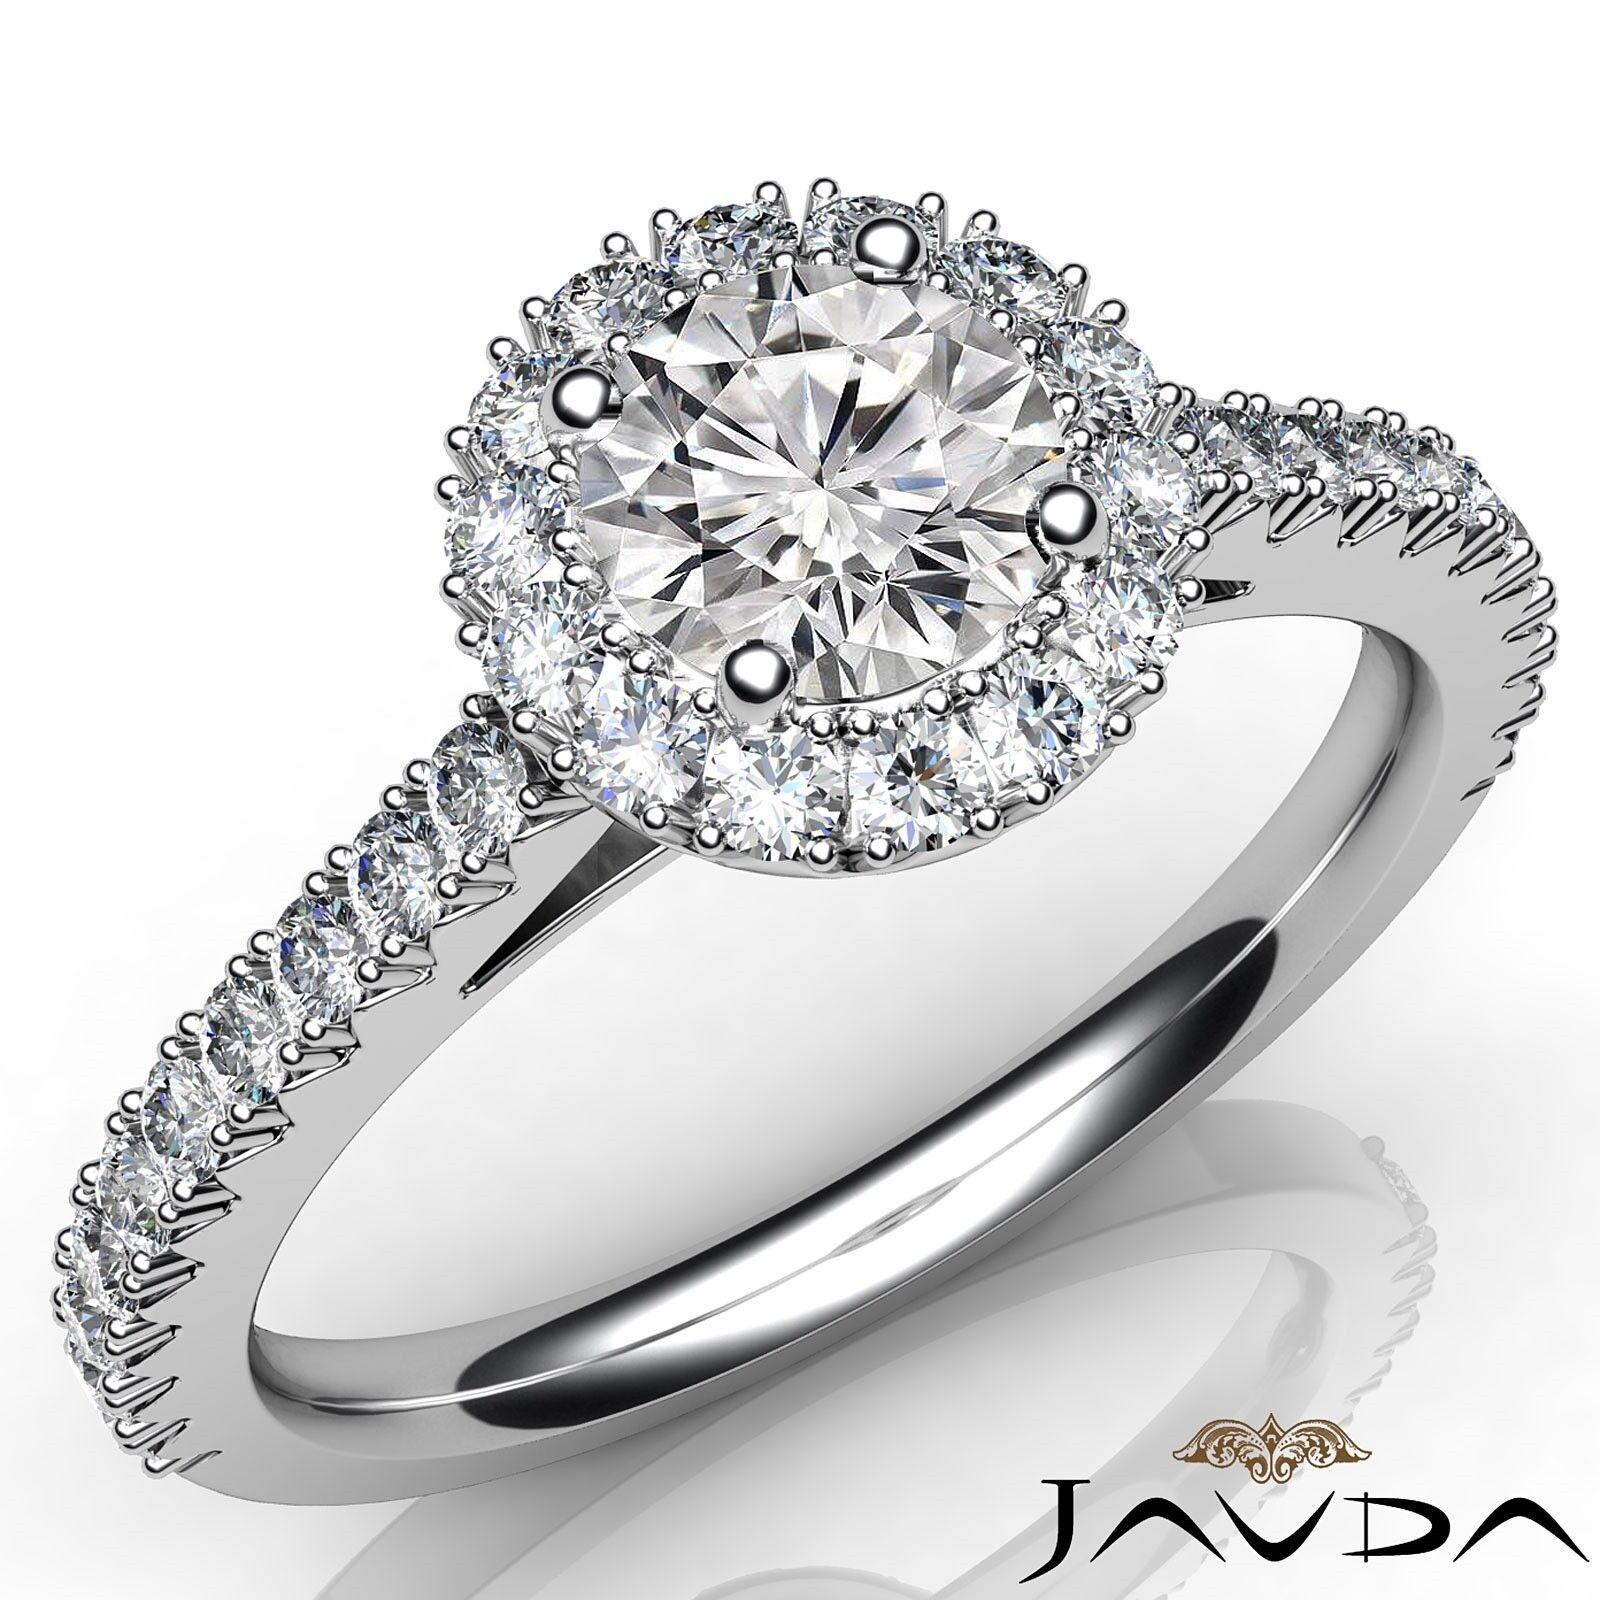 2.2ctw Gala Halo Pave Round Diamond Engagement Ring GIA E-VS1 White Gold Rings